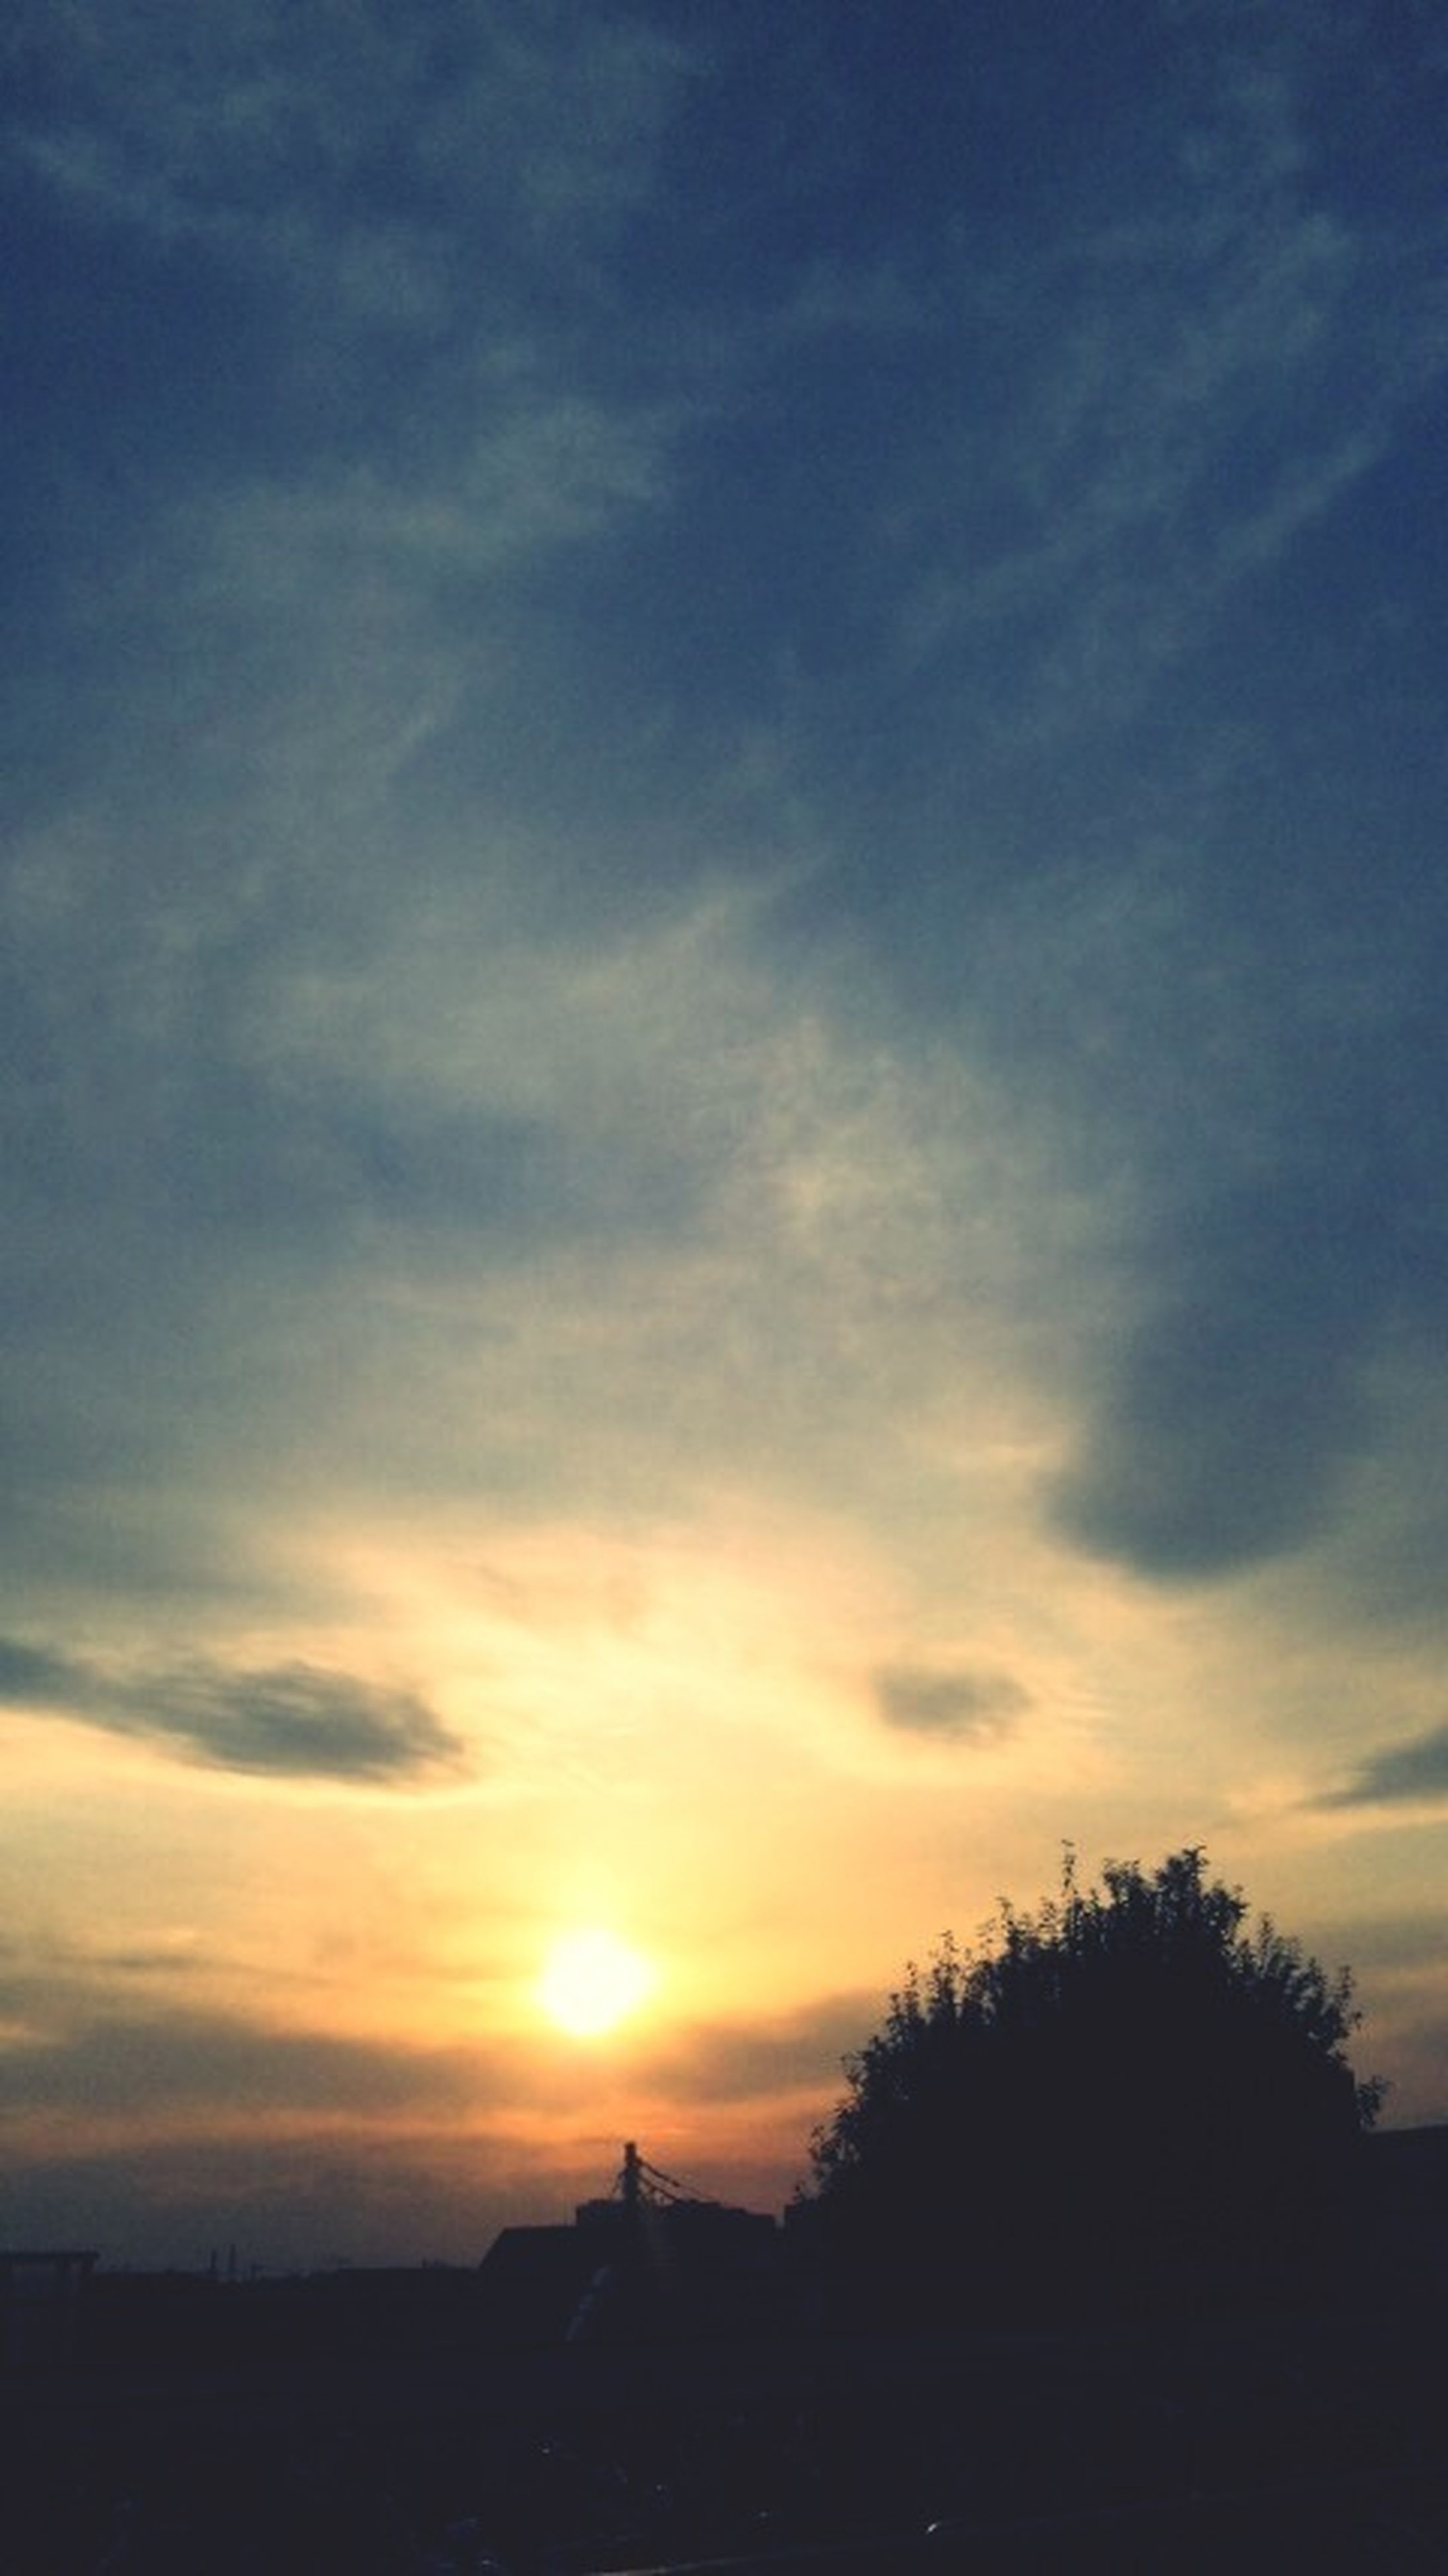 sunset, silhouette, sky, scenics, tranquil scene, beauty in nature, tranquility, cloud - sky, orange color, sun, nature, cloud, idyllic, landscape, sunlight, tree, outdoors, outline, sunbeam, dramatic sky